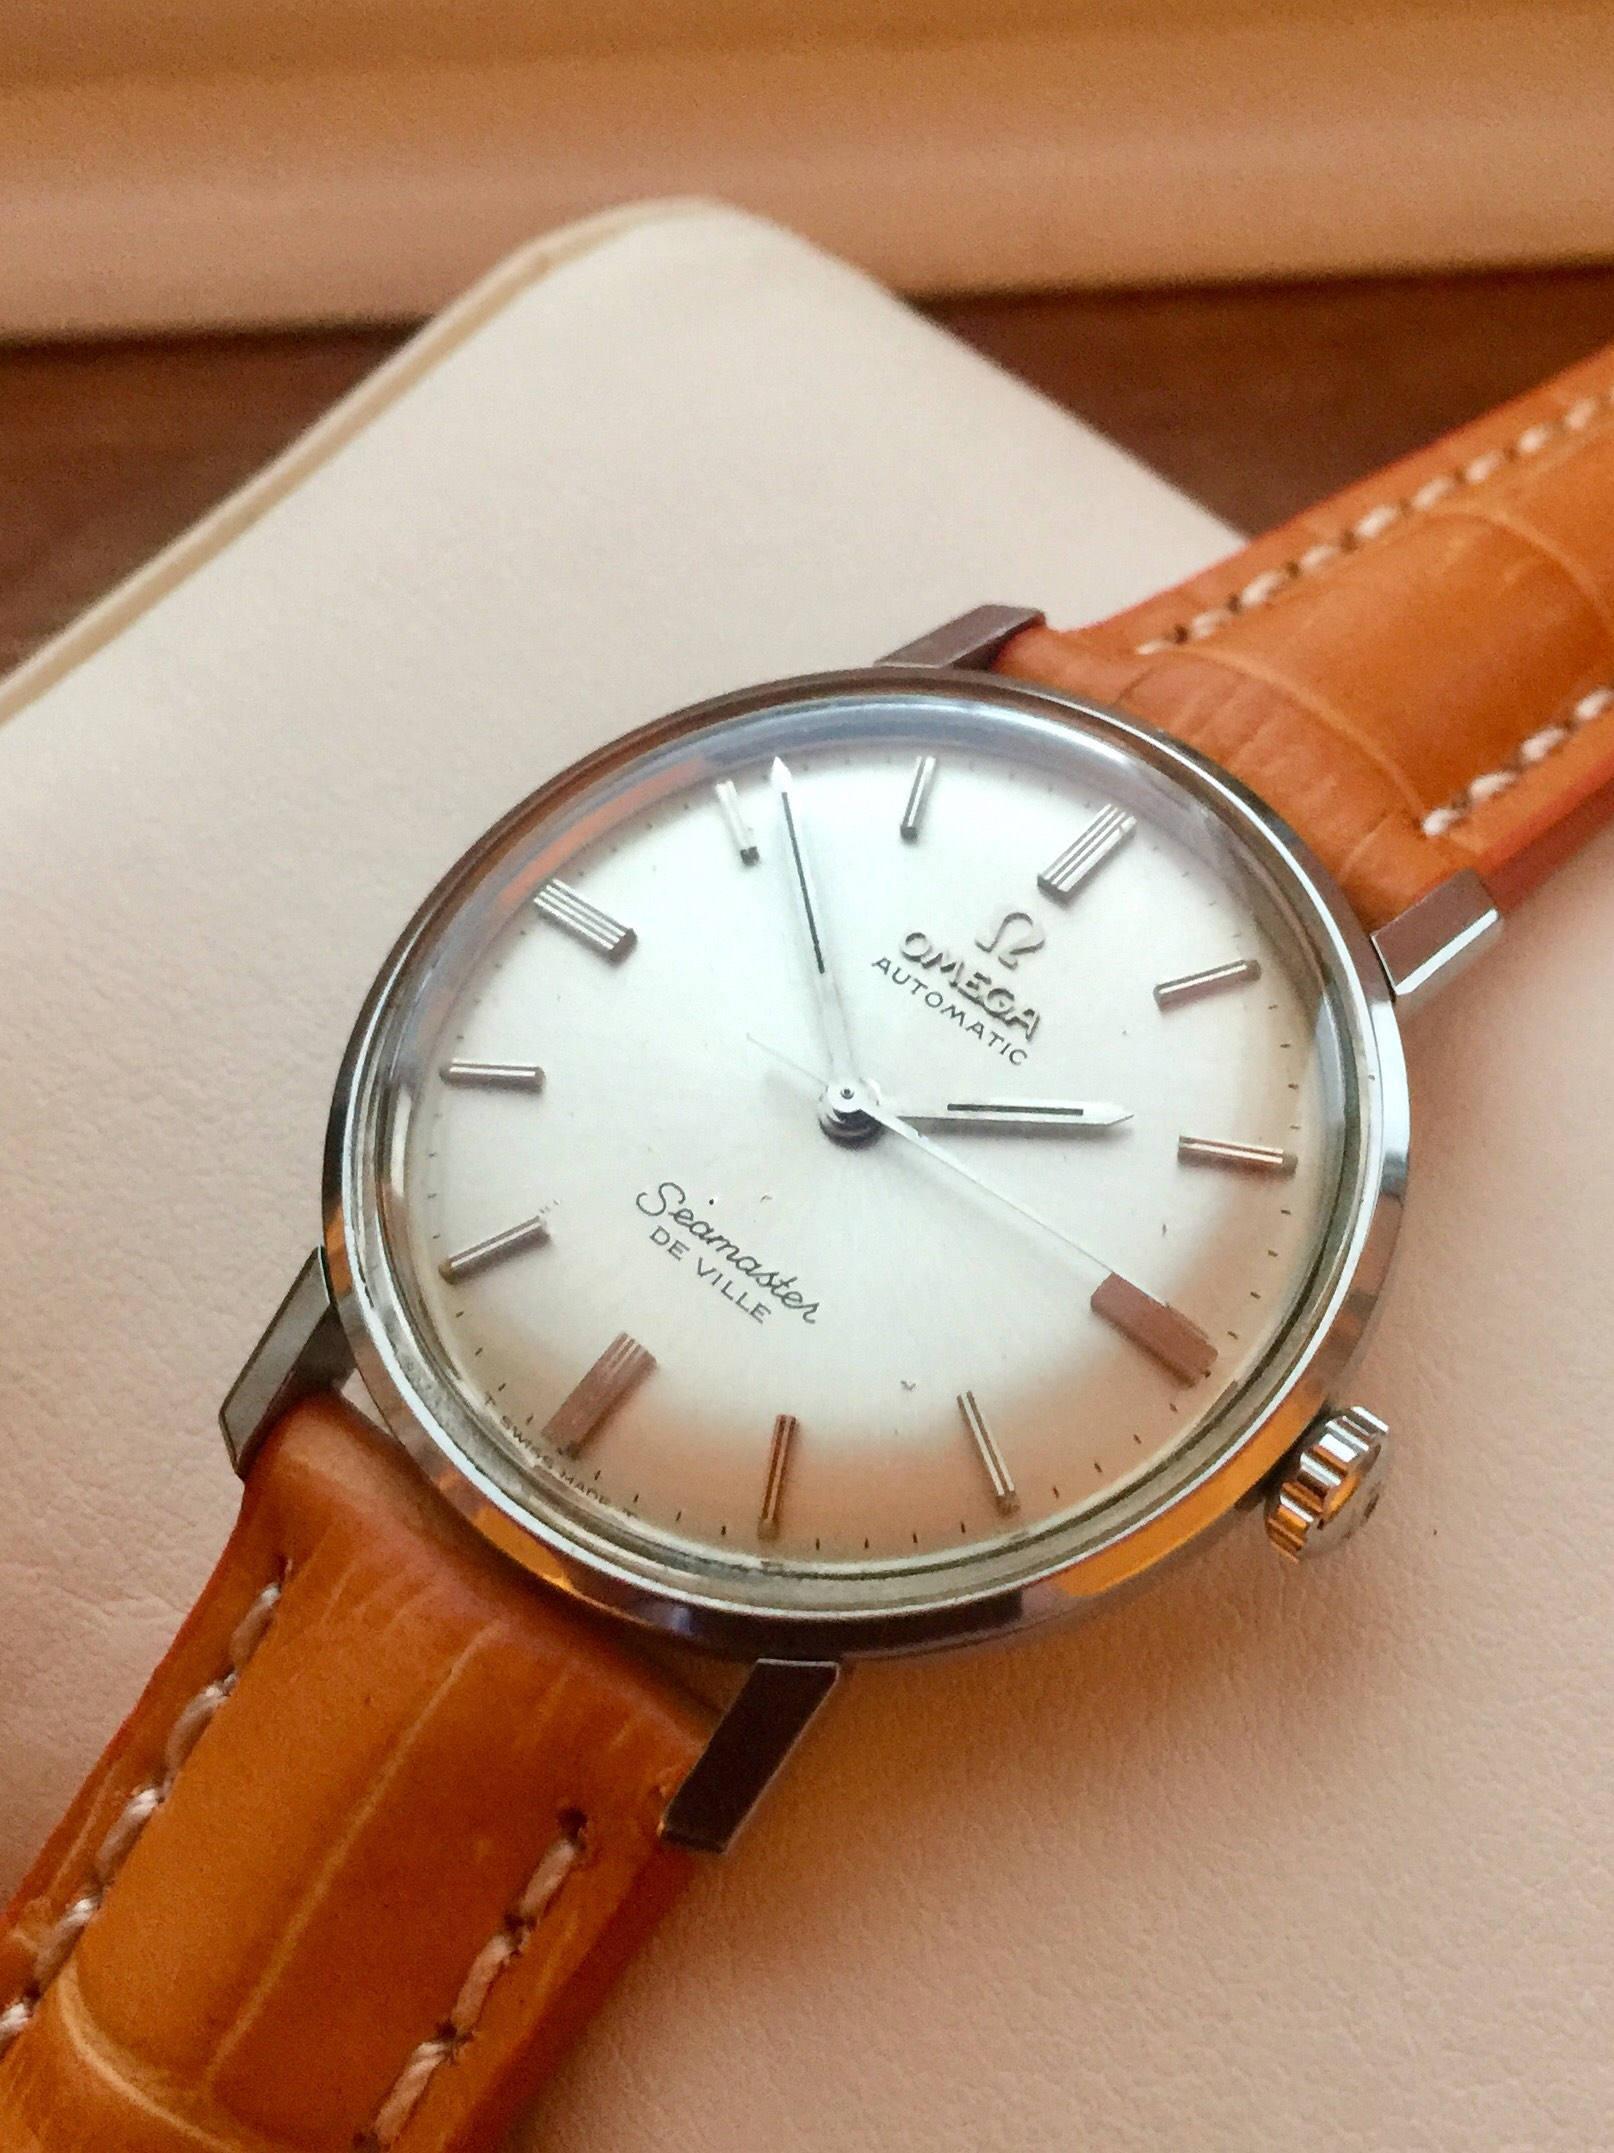 9f9fd132dff74 Vintage Omega Seamaster De Ville Mens watch Automatic watch s s 1970s + Box